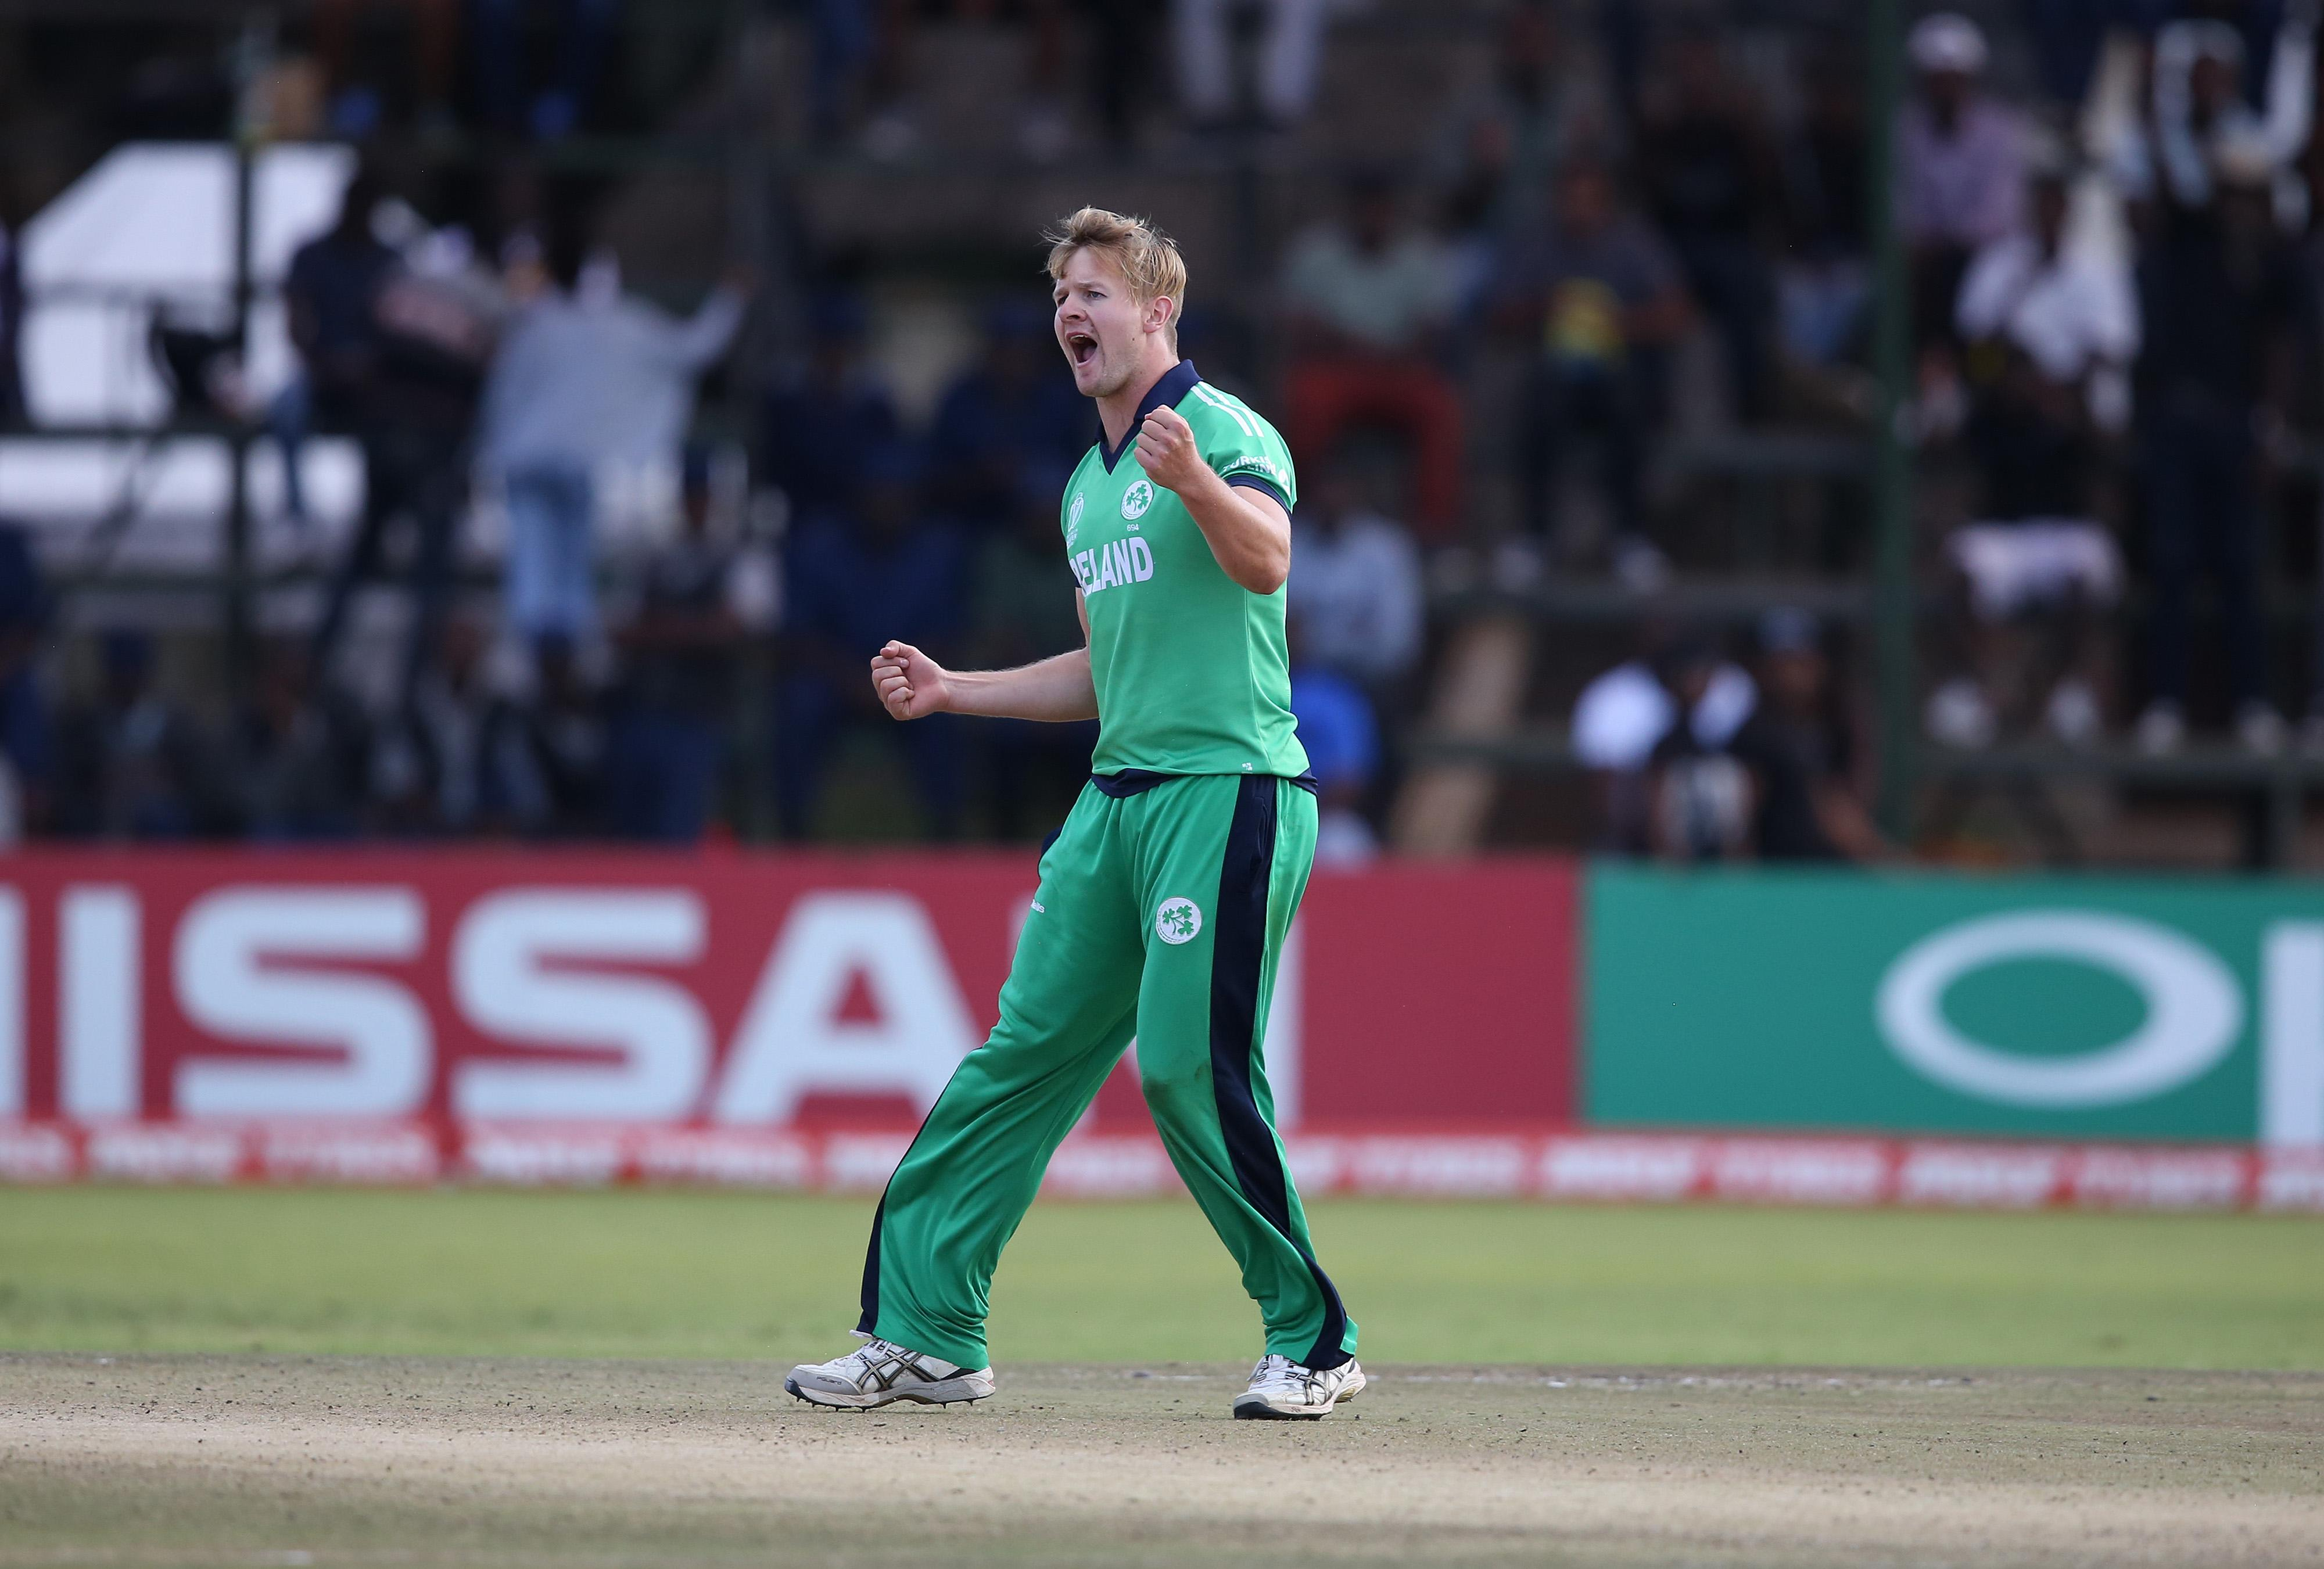 Ireland V Scotland Icc World Cup Qualifiers Super Six